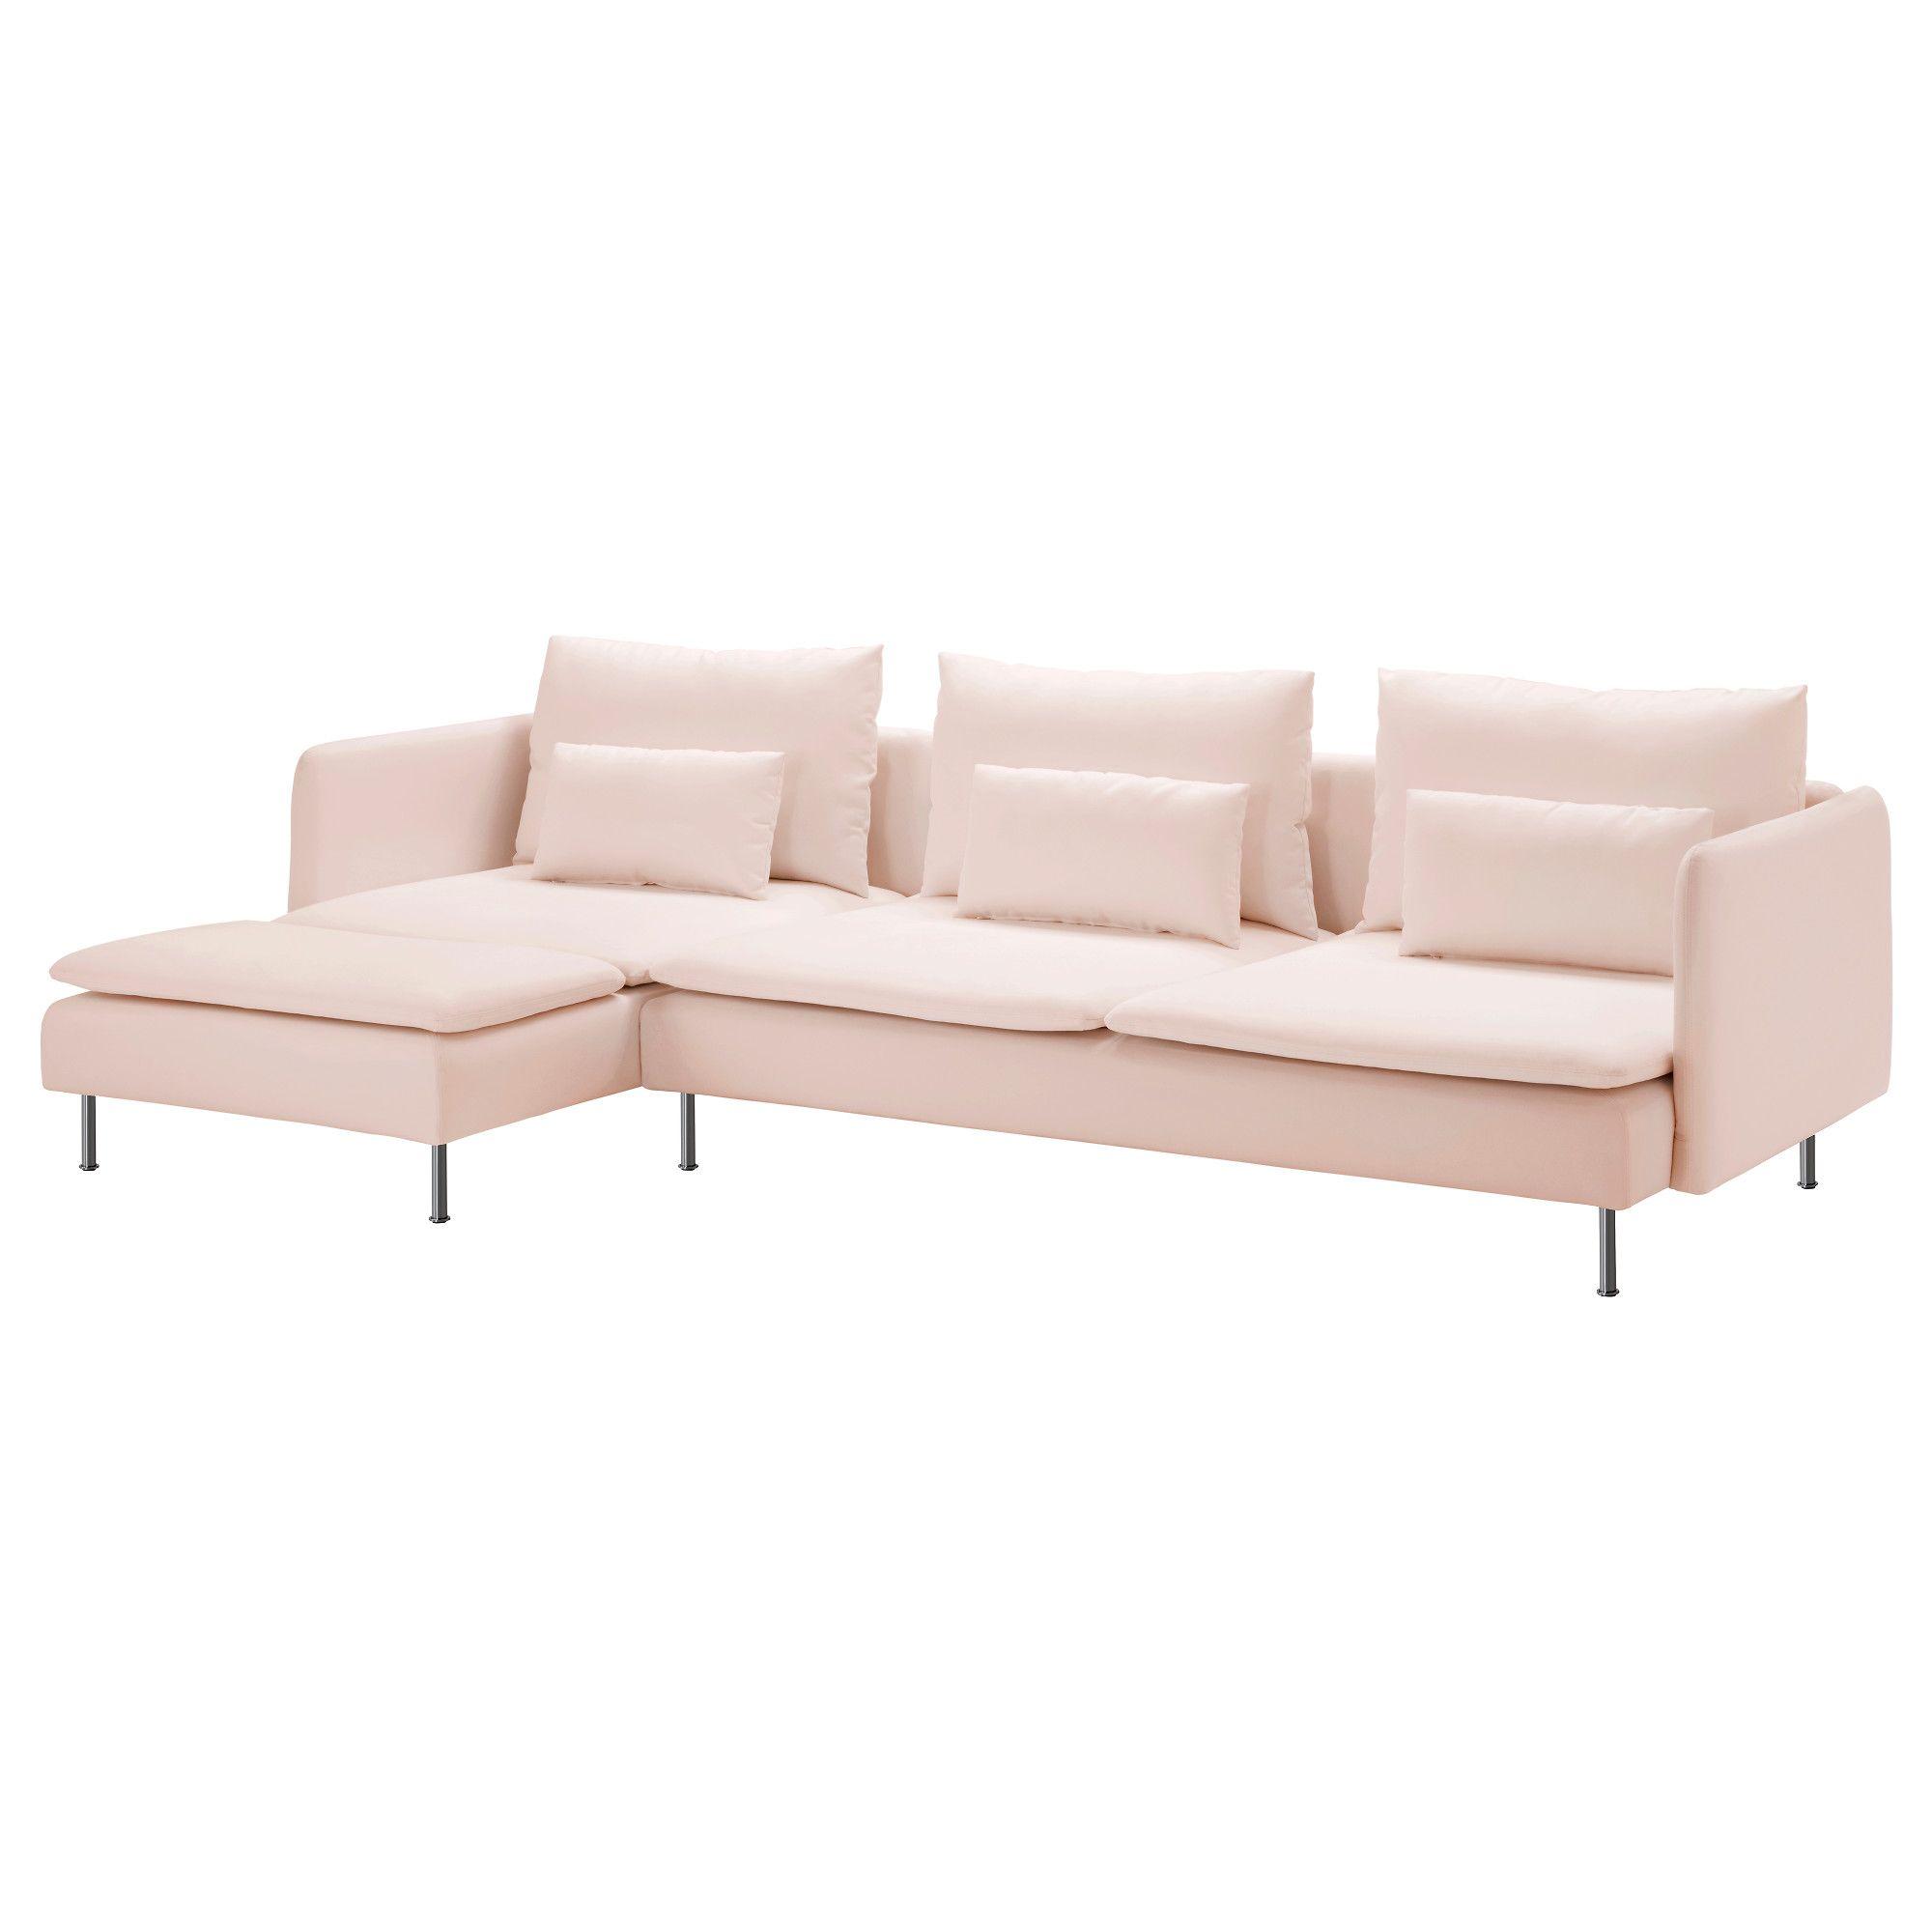 Furniture And Home Furnishings Three Seat Sofa Ikea Sofa Ikea